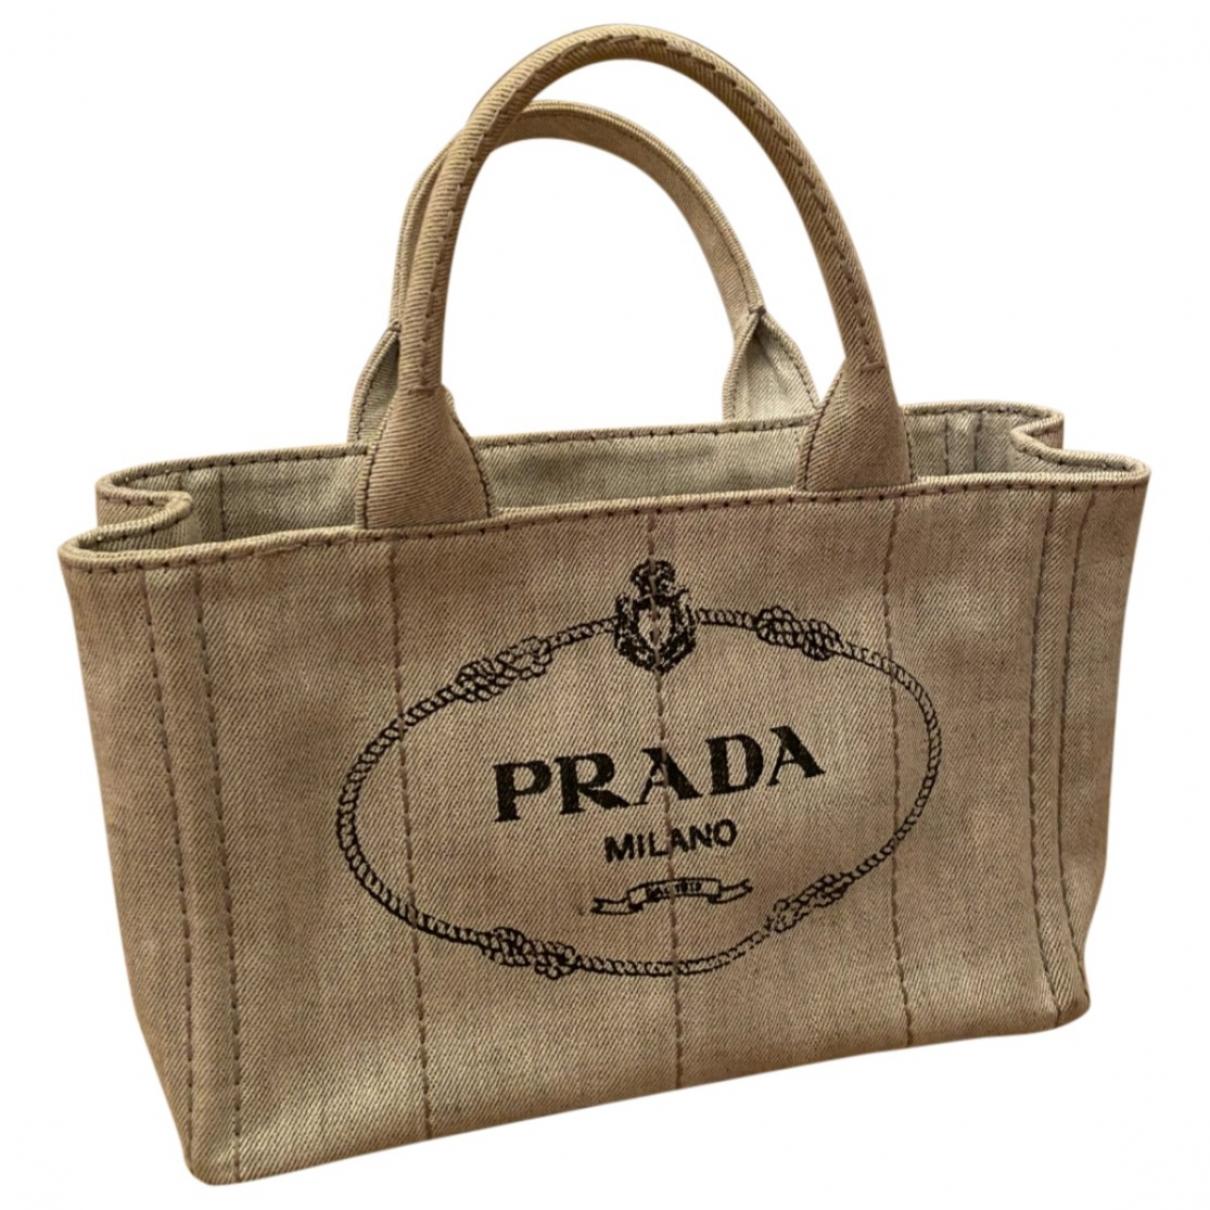 Prada - Sac a main   pour femme en toile - gris